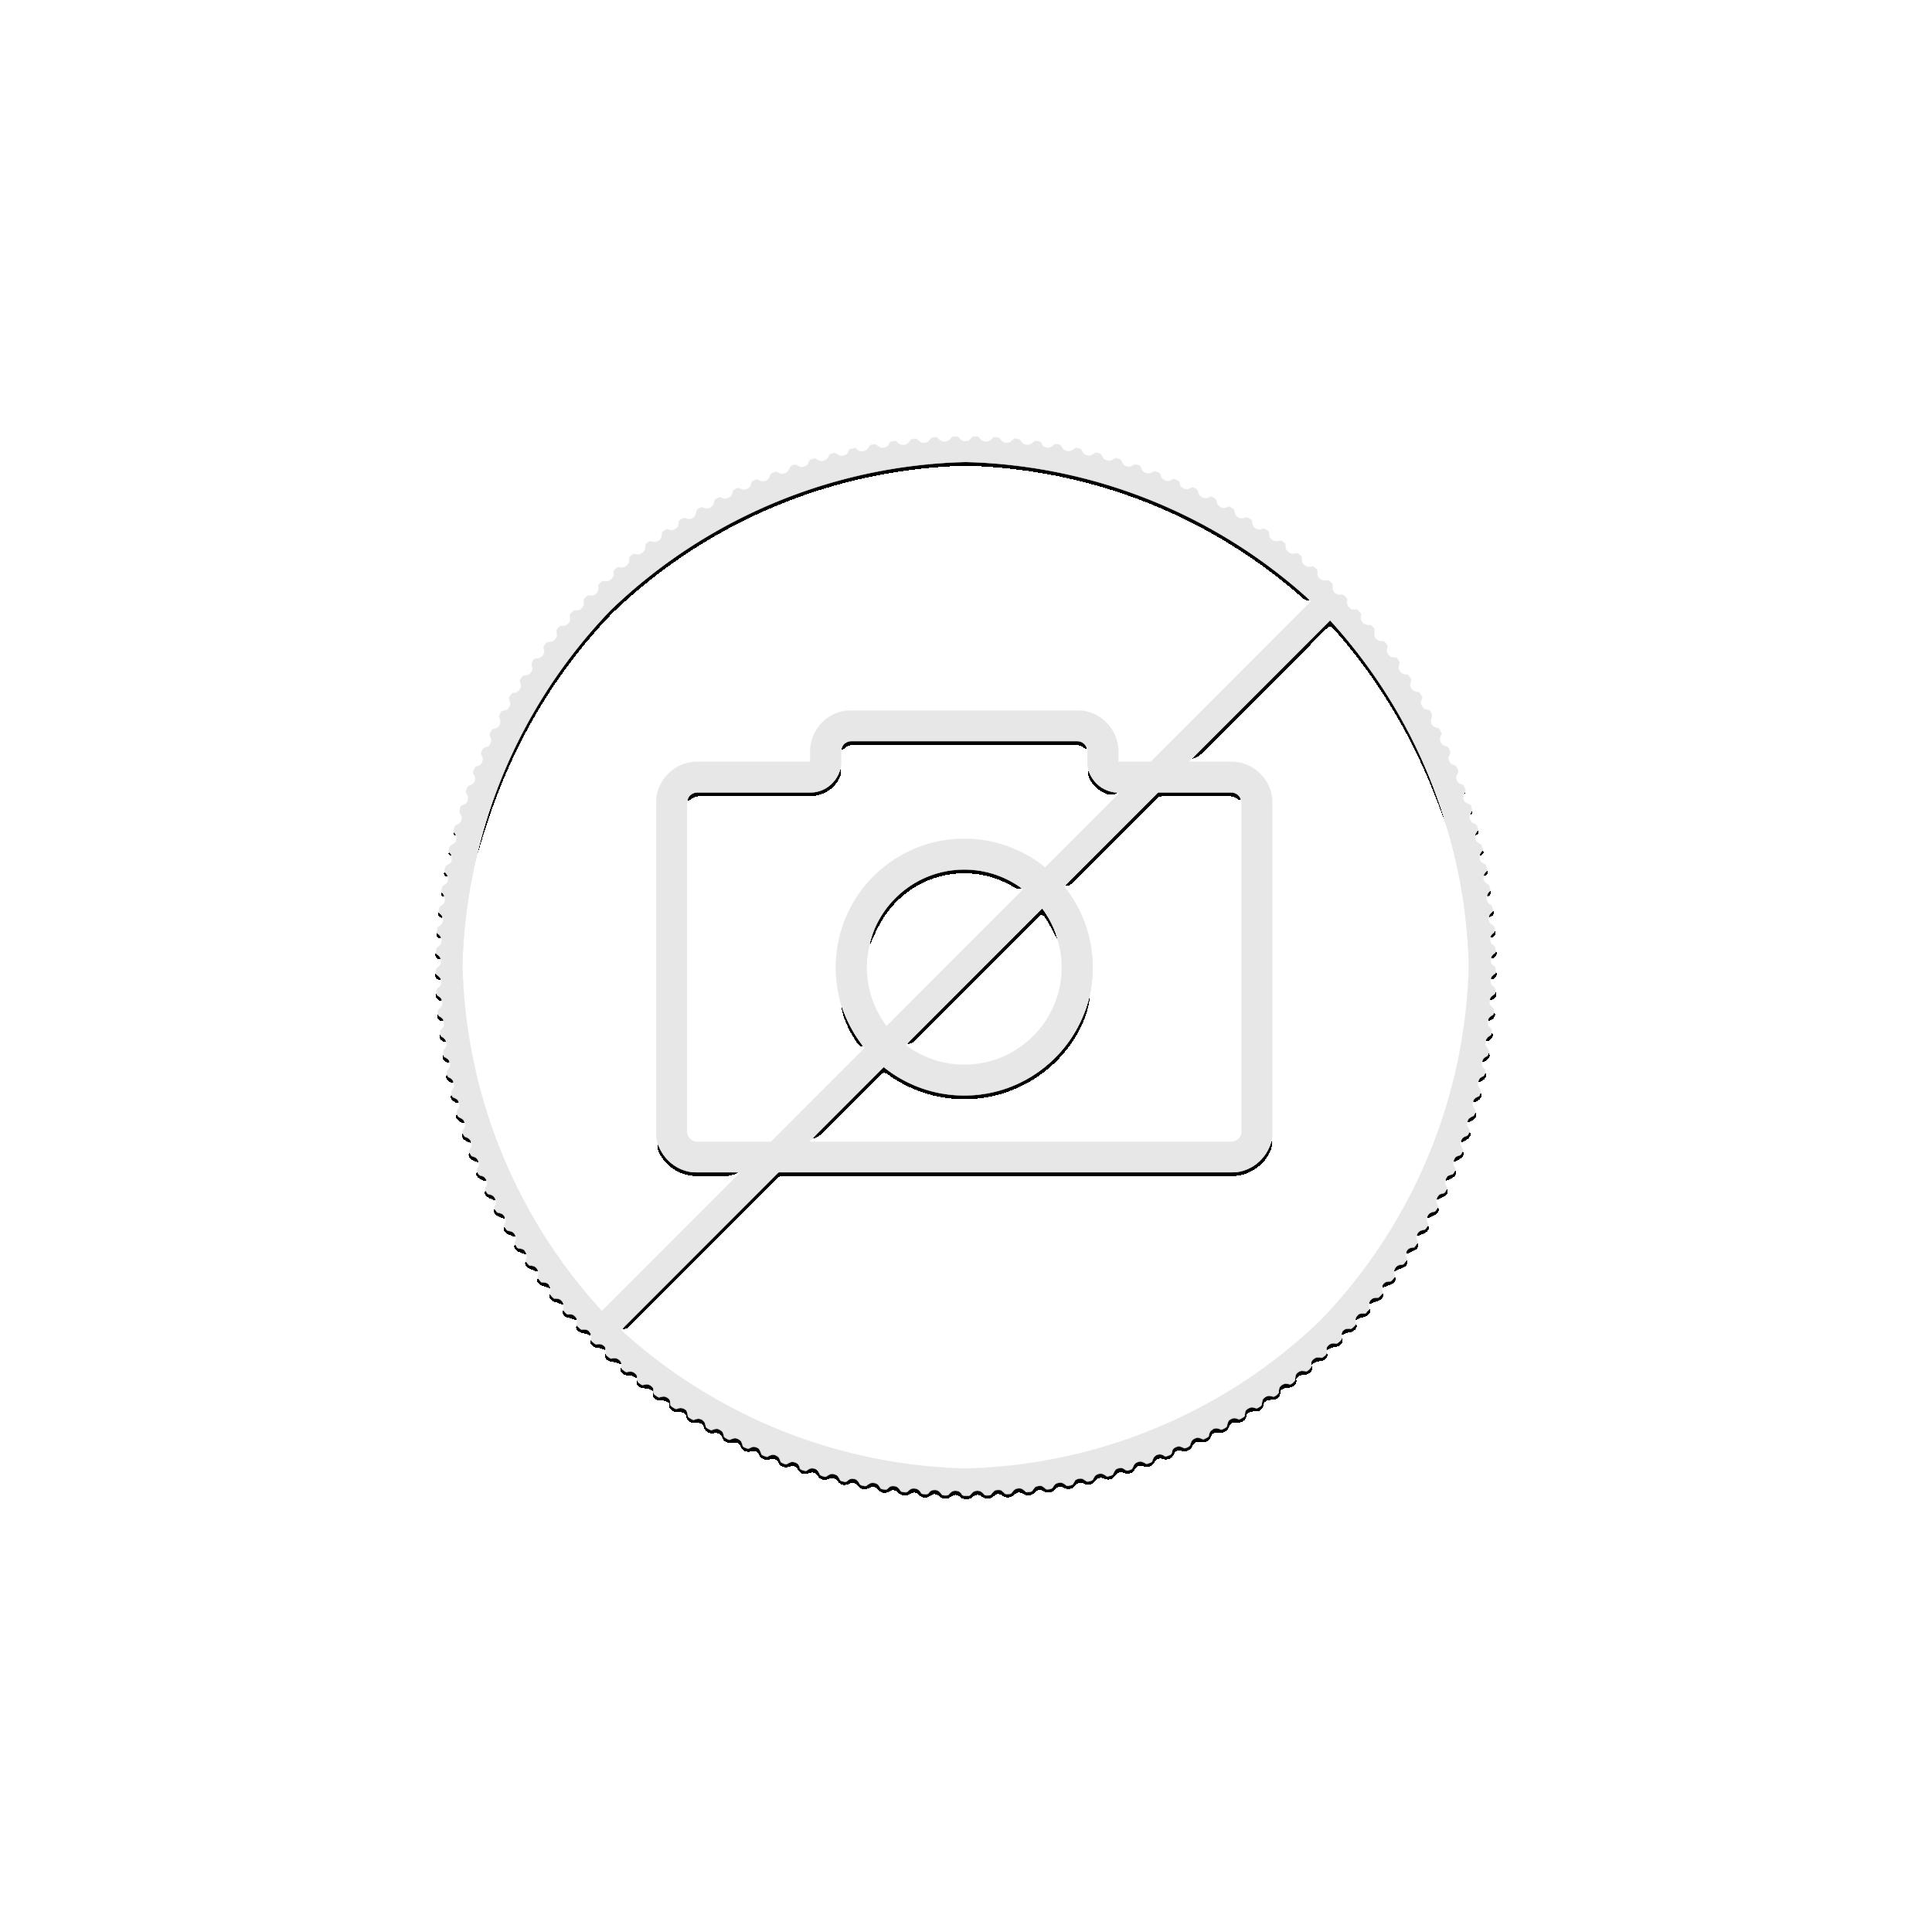 Discover Australia 1/2 troy ounce goud originele verpakking